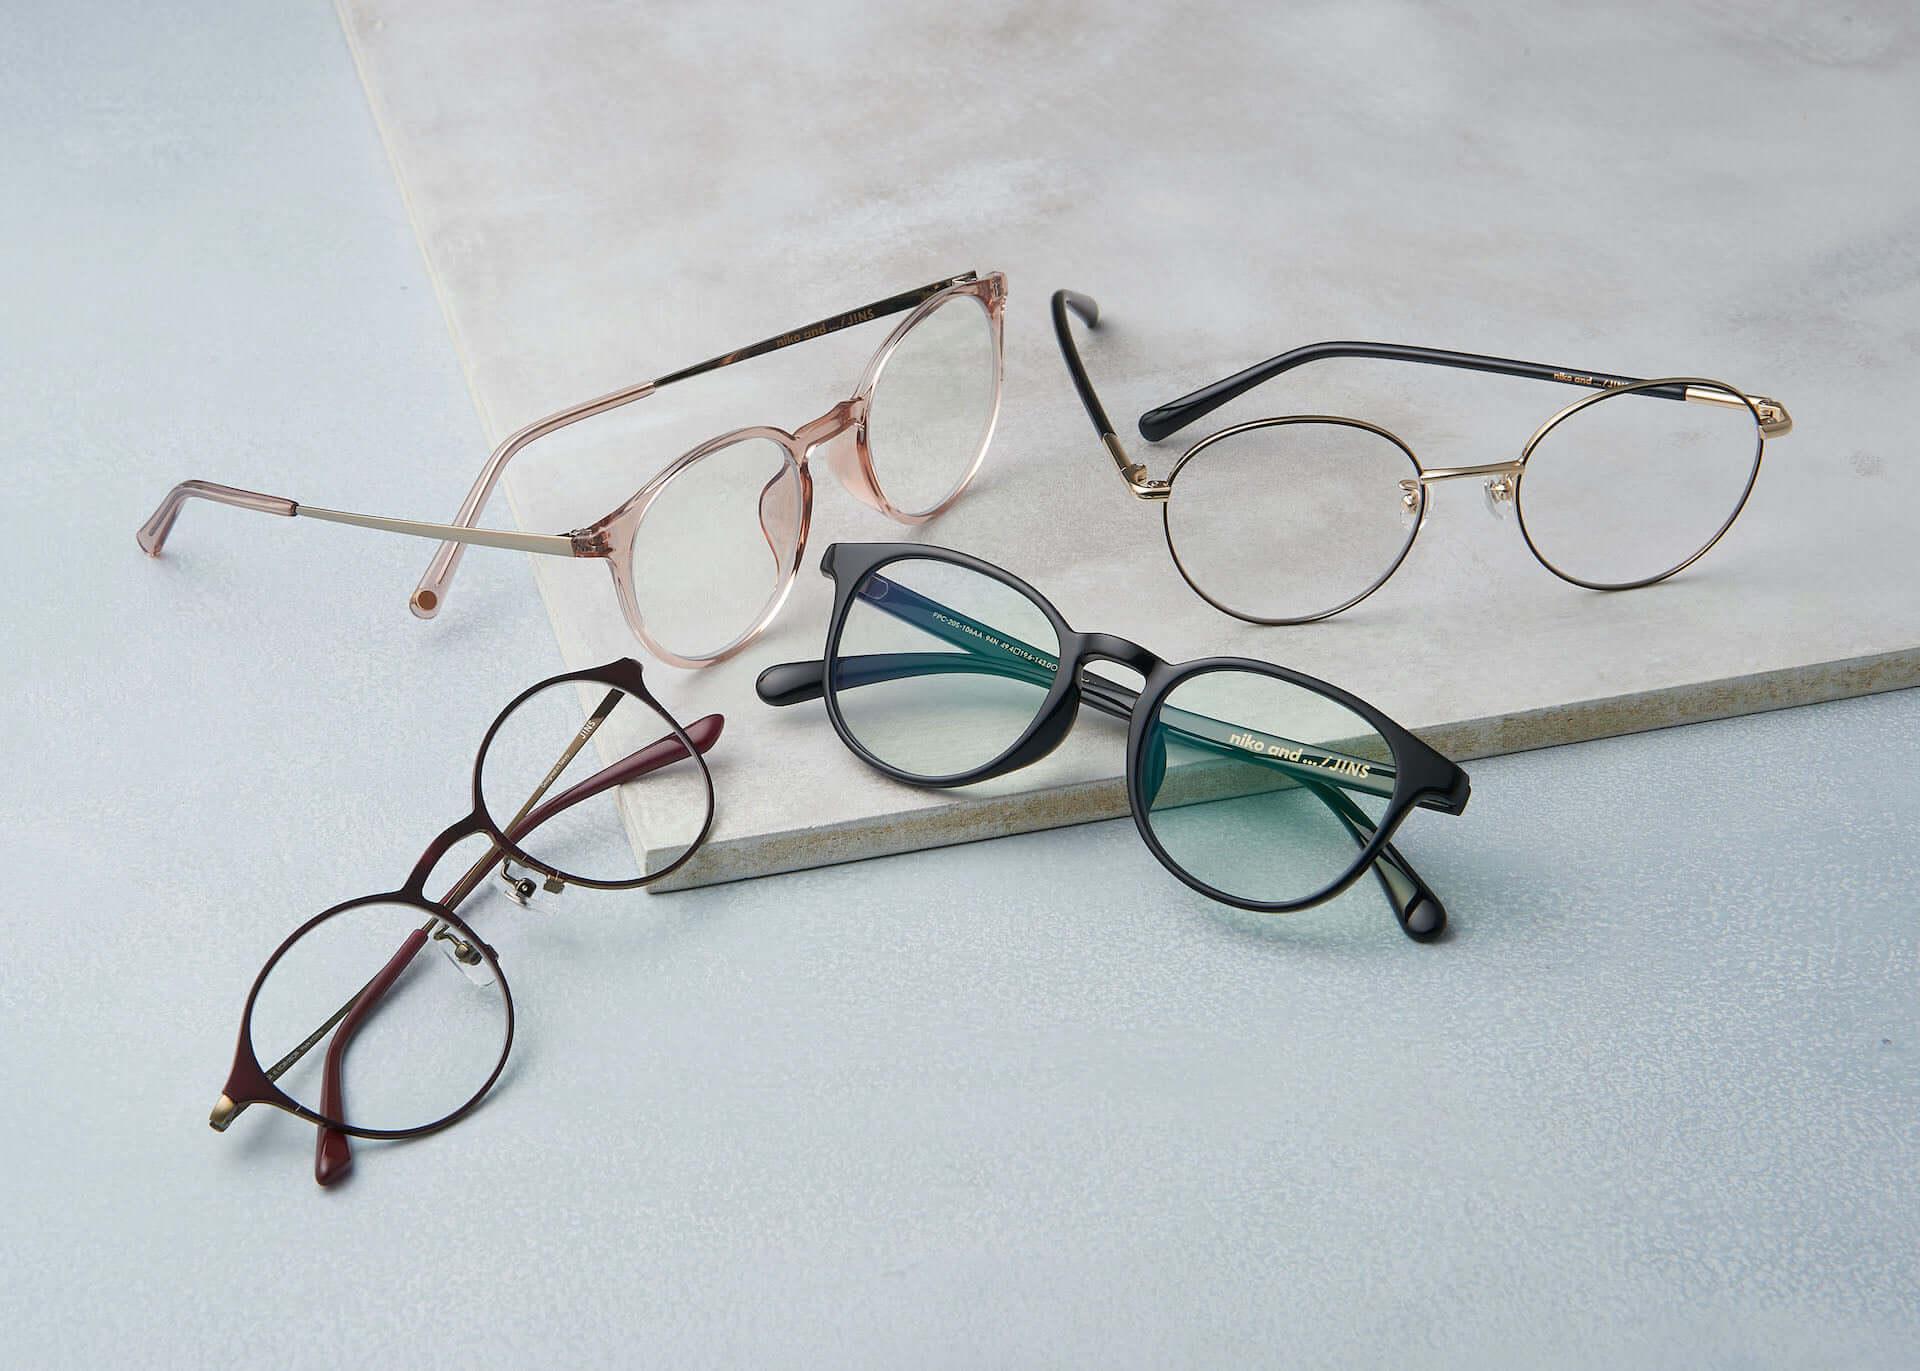 niko and …とJINSのコラボアイテム最新作が発売!ブルーライトカットメガネやクラウンパントも登場 lf200421_nikoand_2-1920x1371